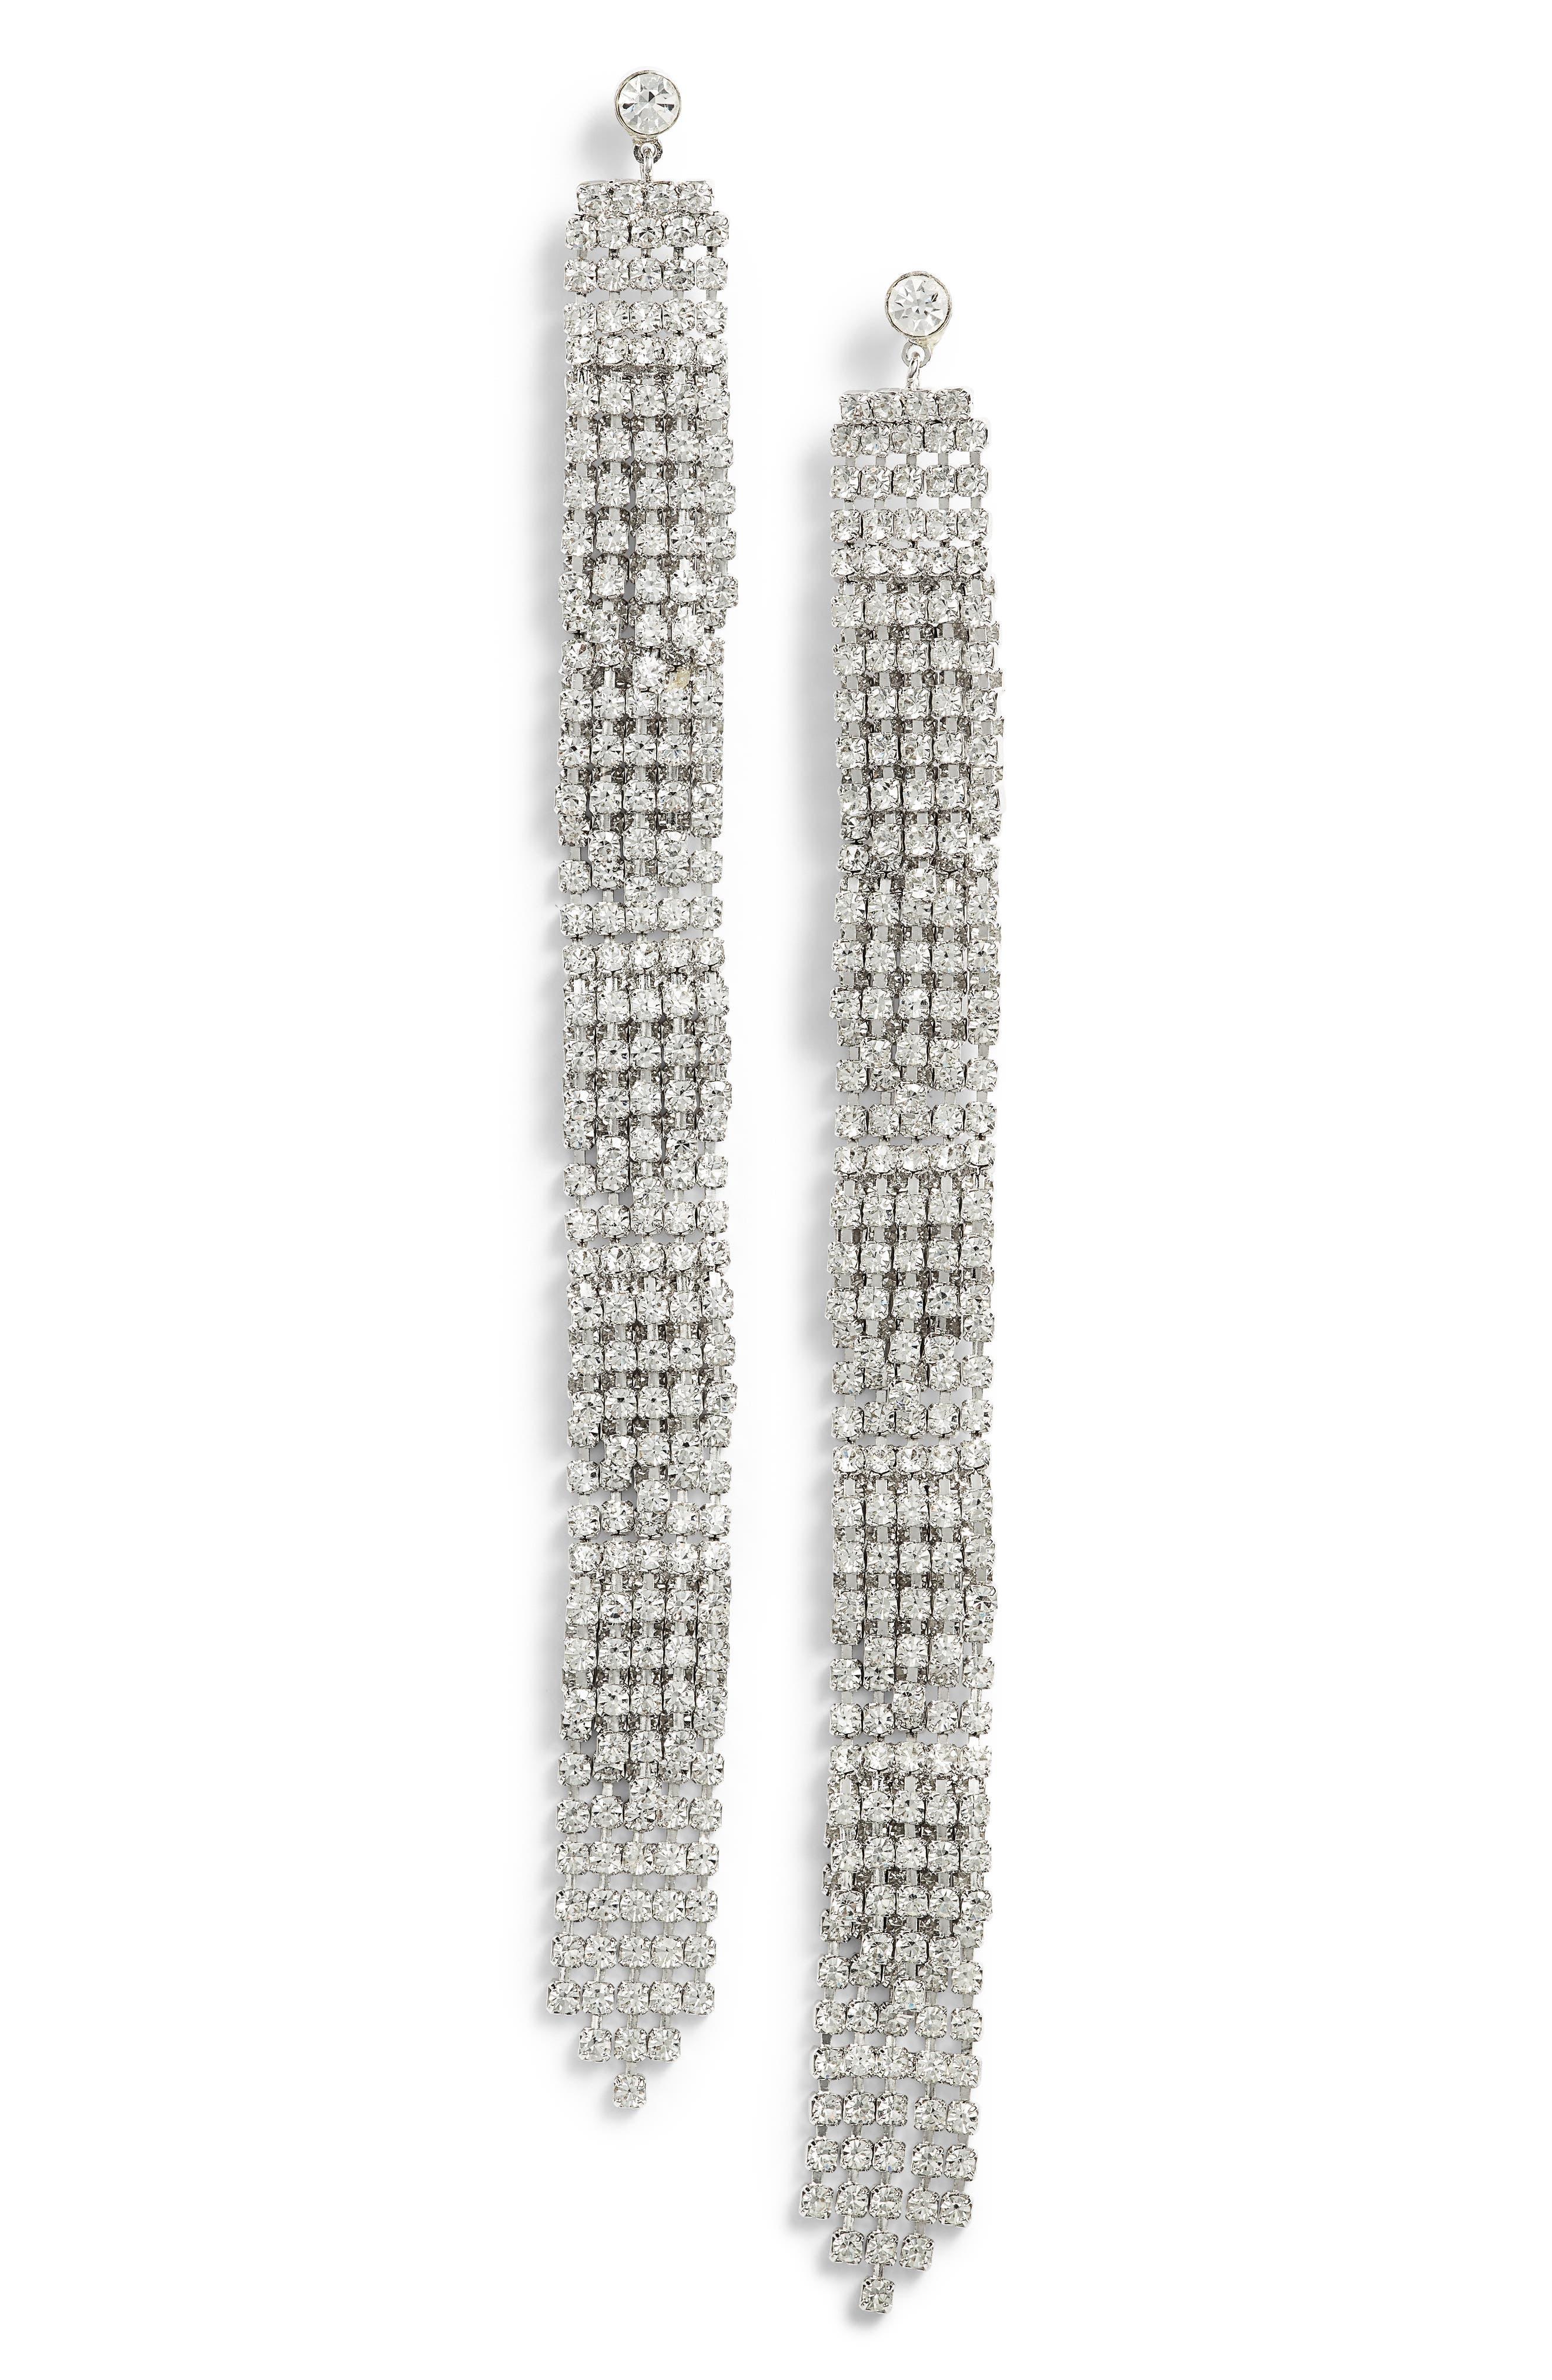 Crystal Fringe Shoulder Duster Earrings,                             Main thumbnail 1, color,                             Crystal